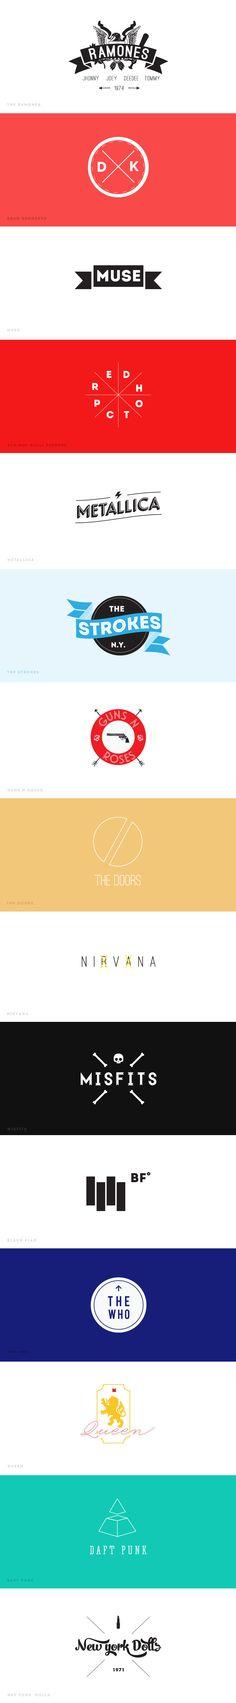 Rock Bands Logos Hipster Design http://www.behance.net/gallery/Bands-Hipsterized/10647349 ¡Hipsterized!